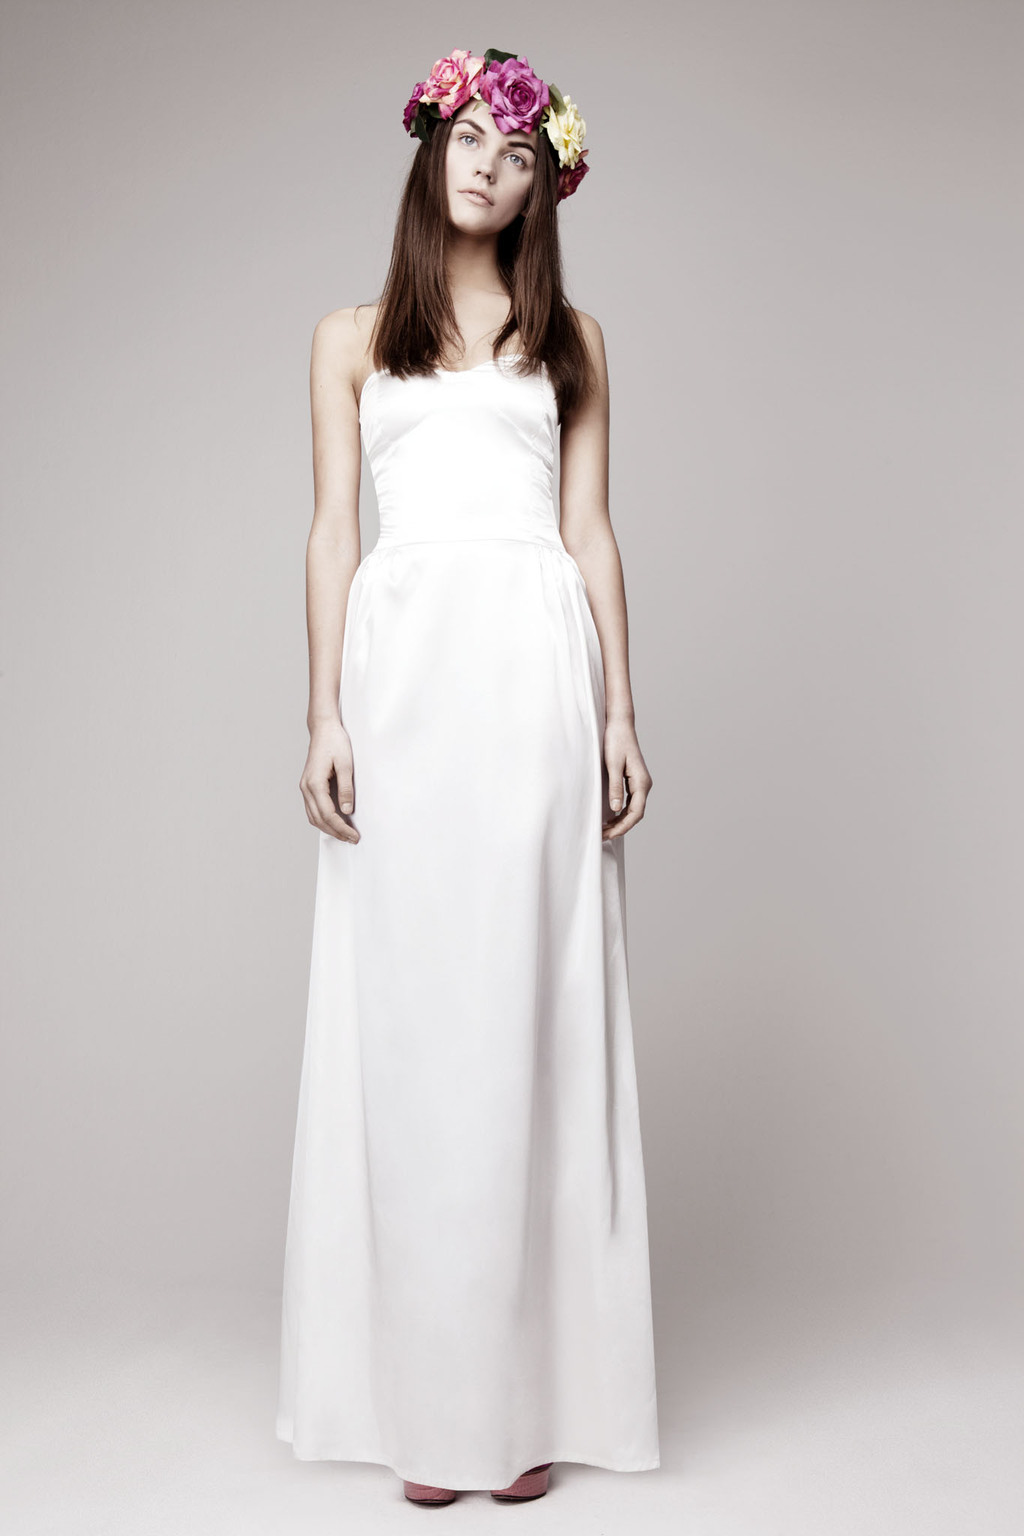 Simple-wedding-dress-for-vintage-or-modern-brides-4.full